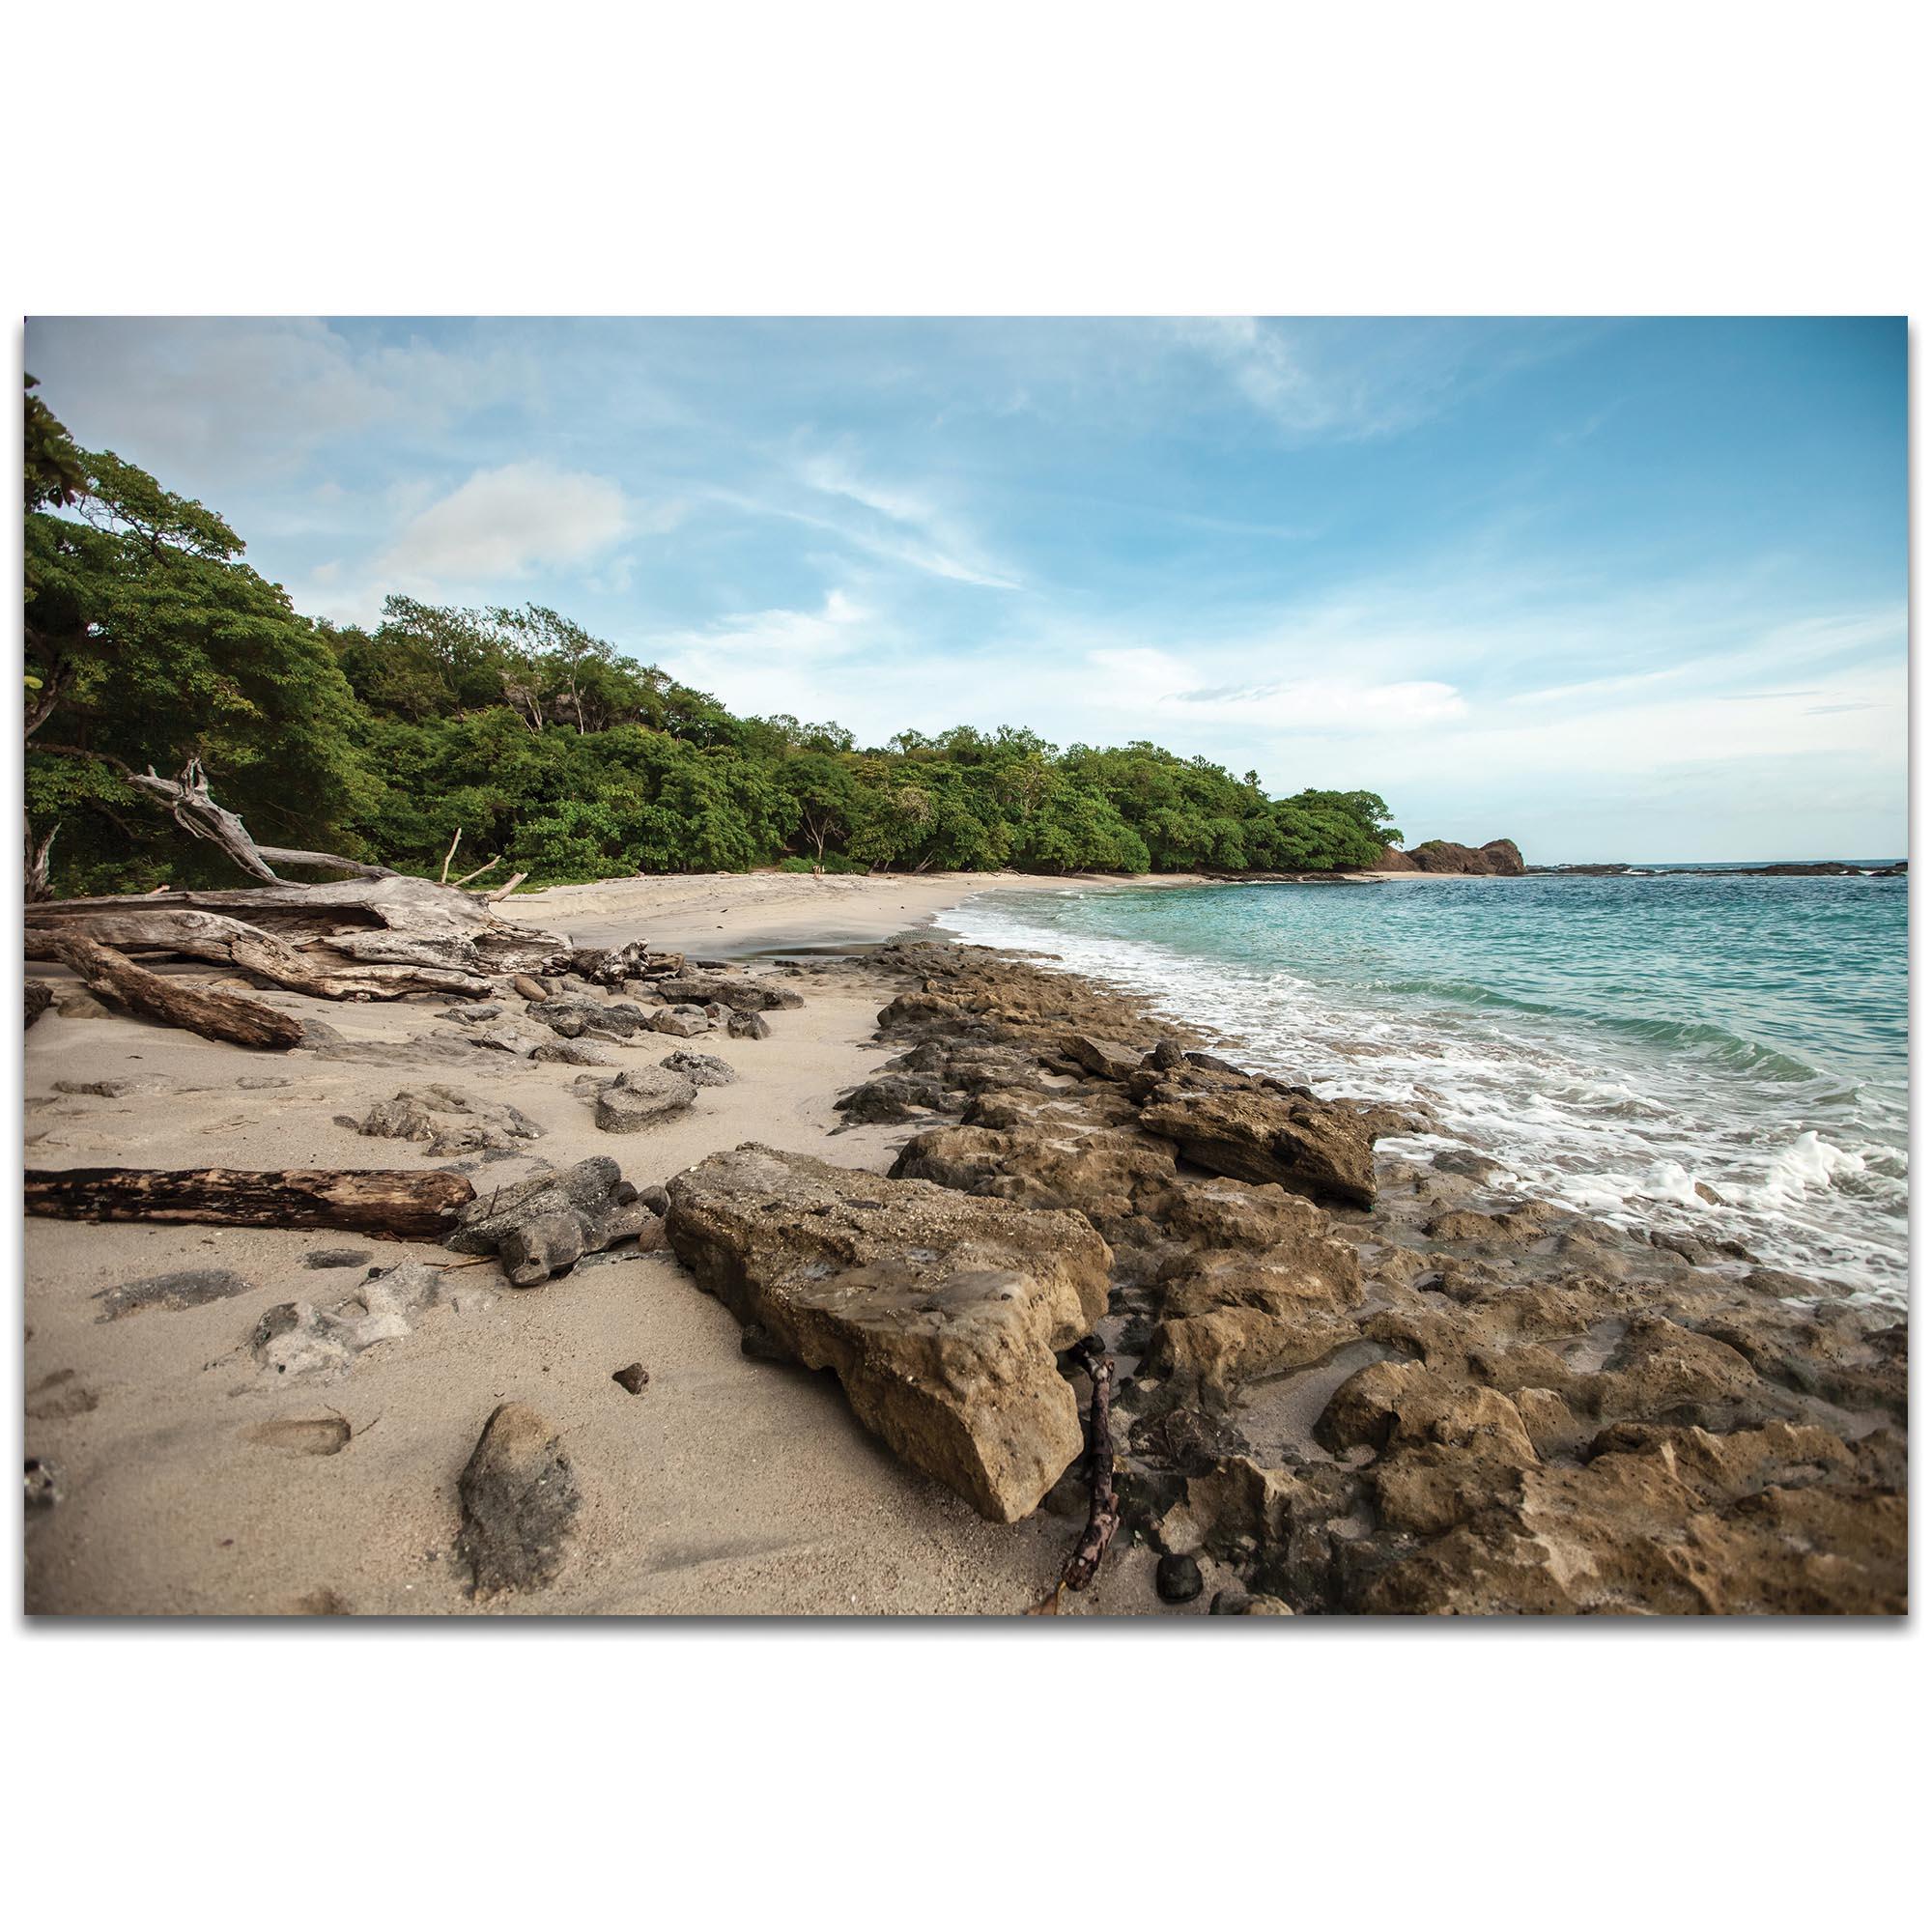 Coastal Wall Art metal art studio - tropical junglemeirav levy - coastal wall